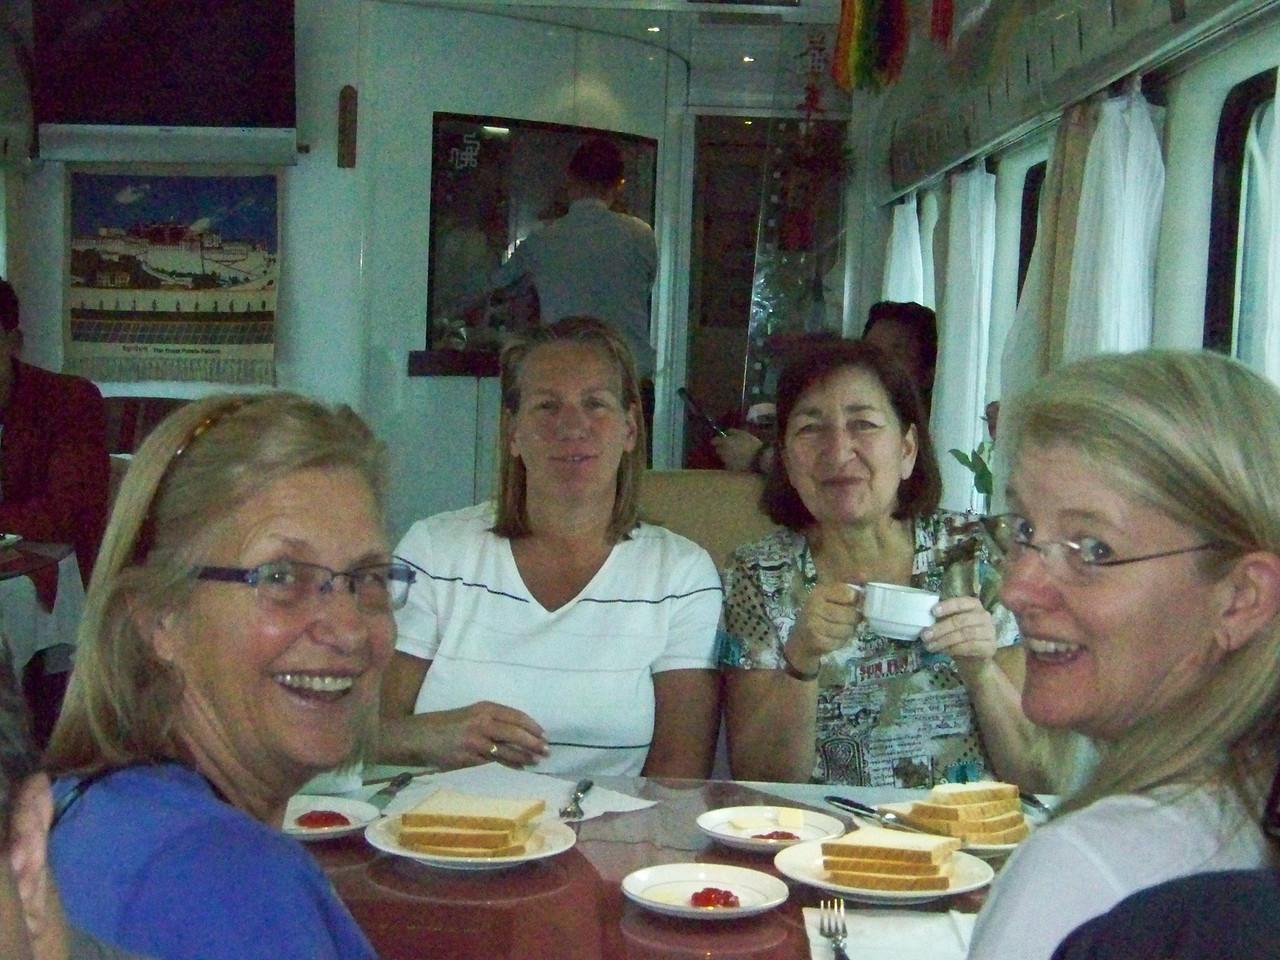 0098 - Sharon Lorie Beryl Sarah having Breakfast in Dining Car 2nd Morning on Train Trip Between Beijing and Lhasa.JPG